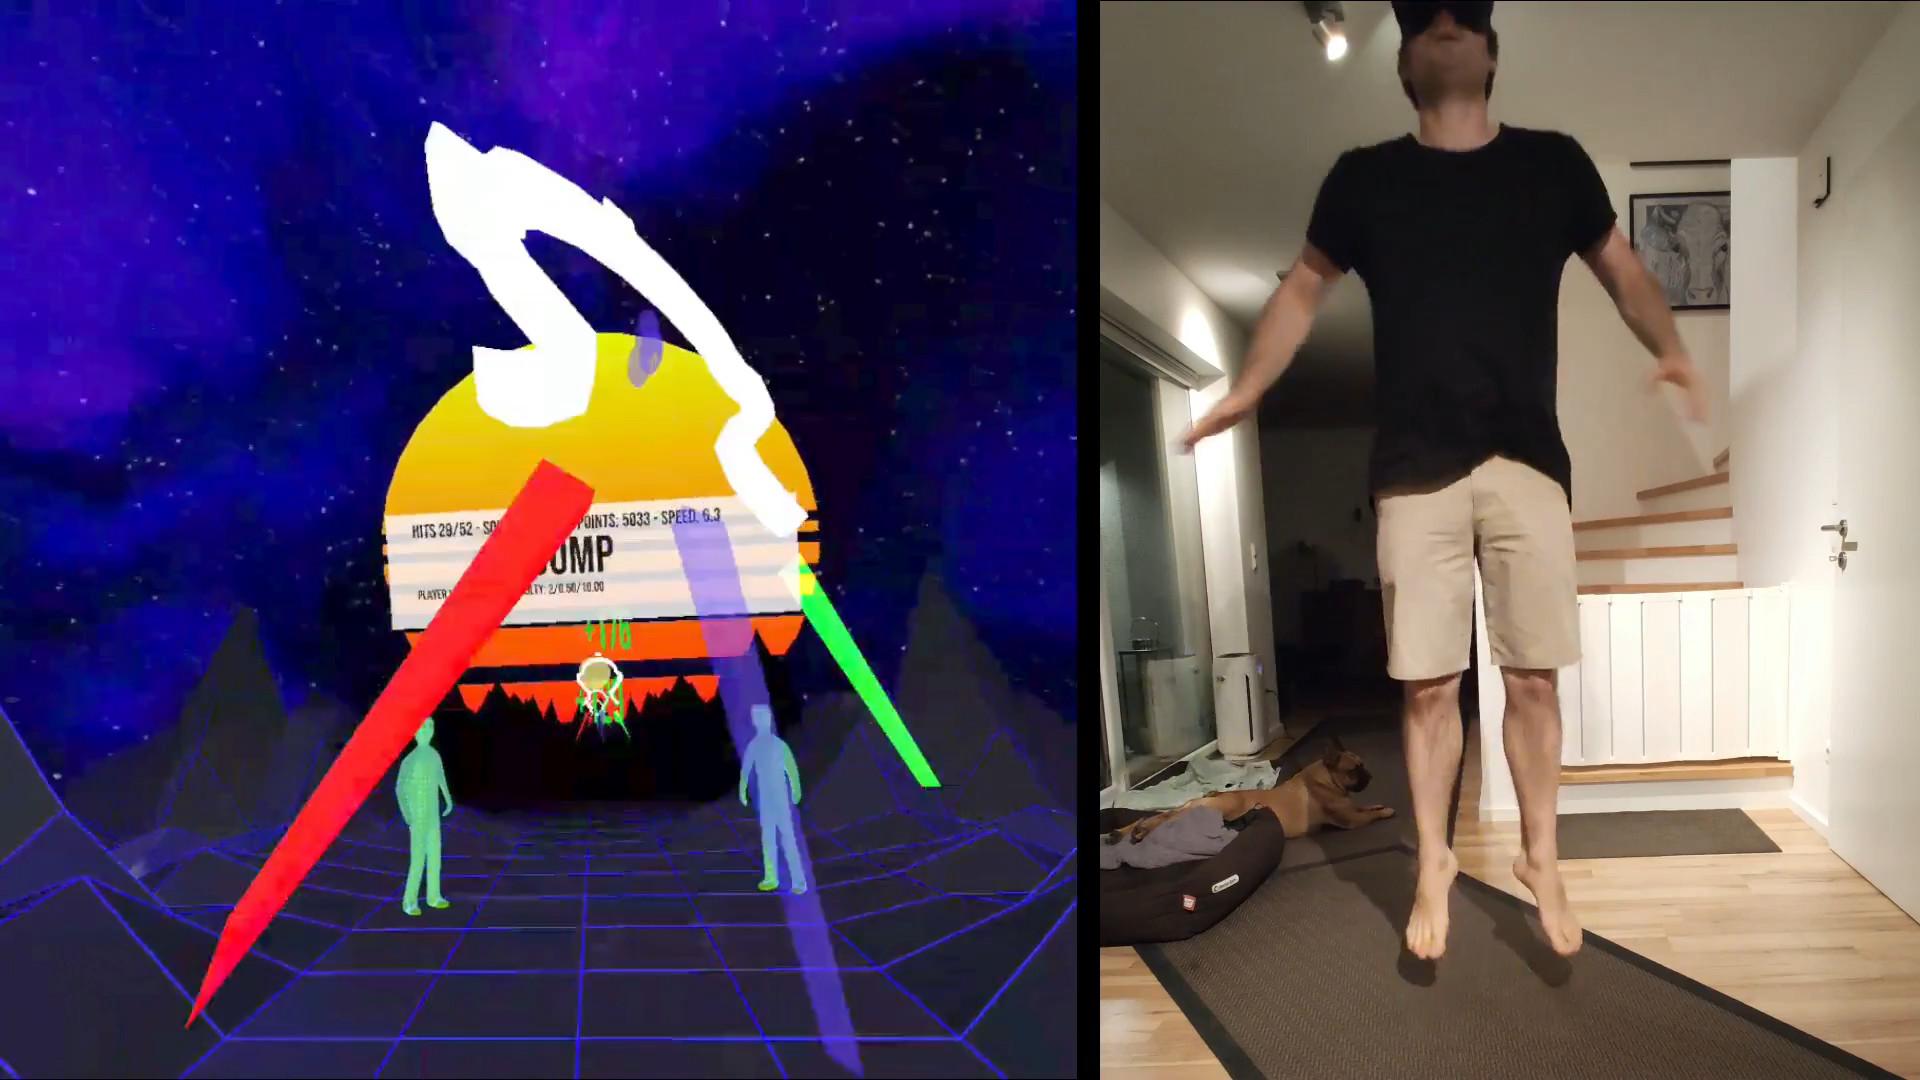 A New Fitness Challenge - VRWorkout!